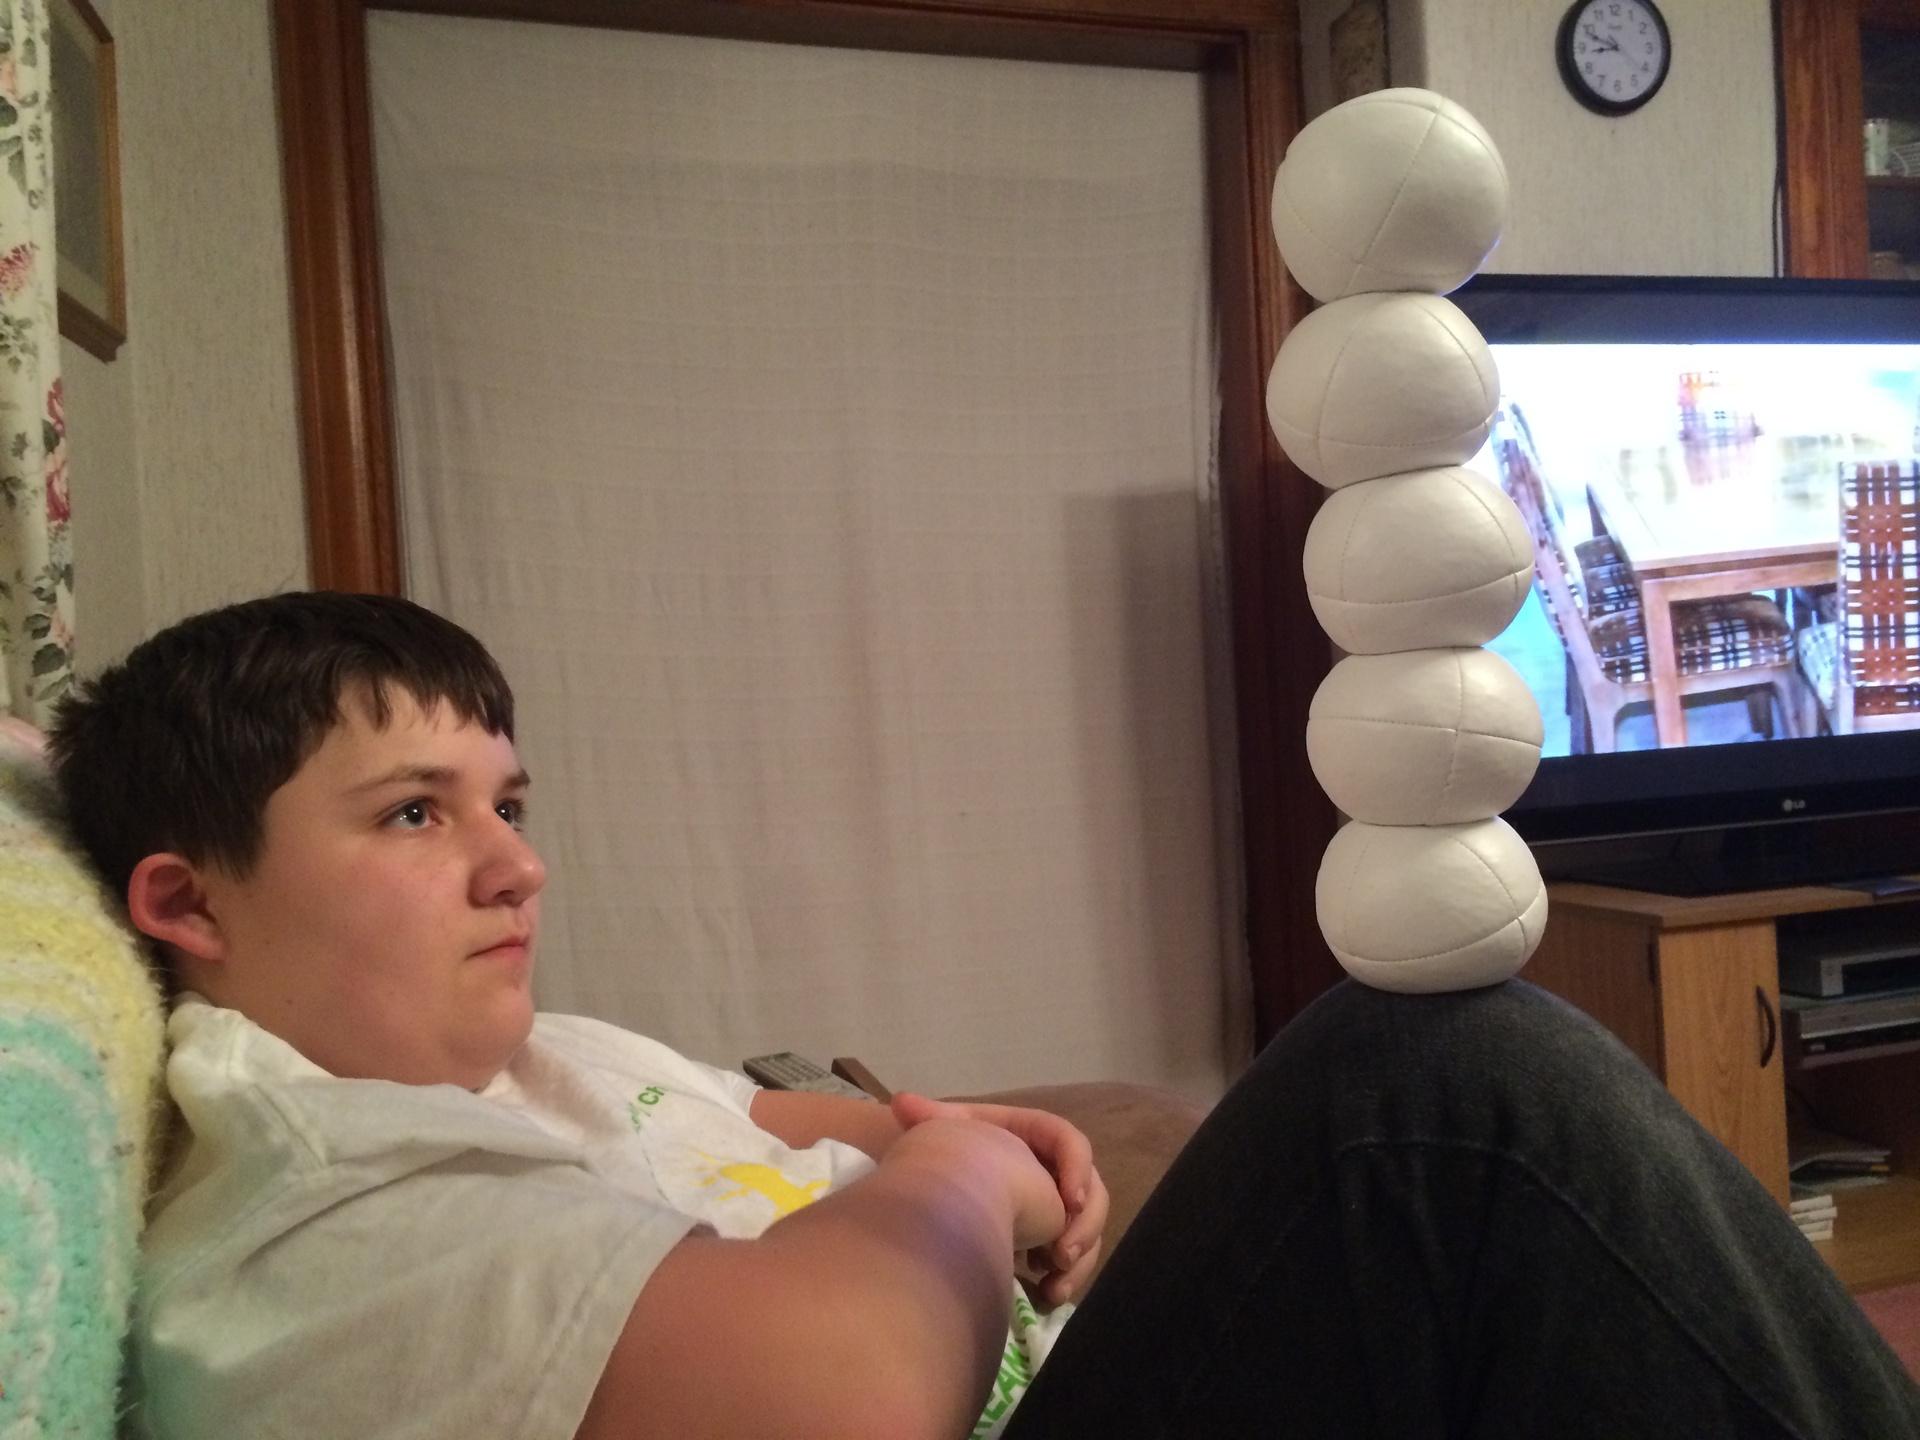 5 ball balance